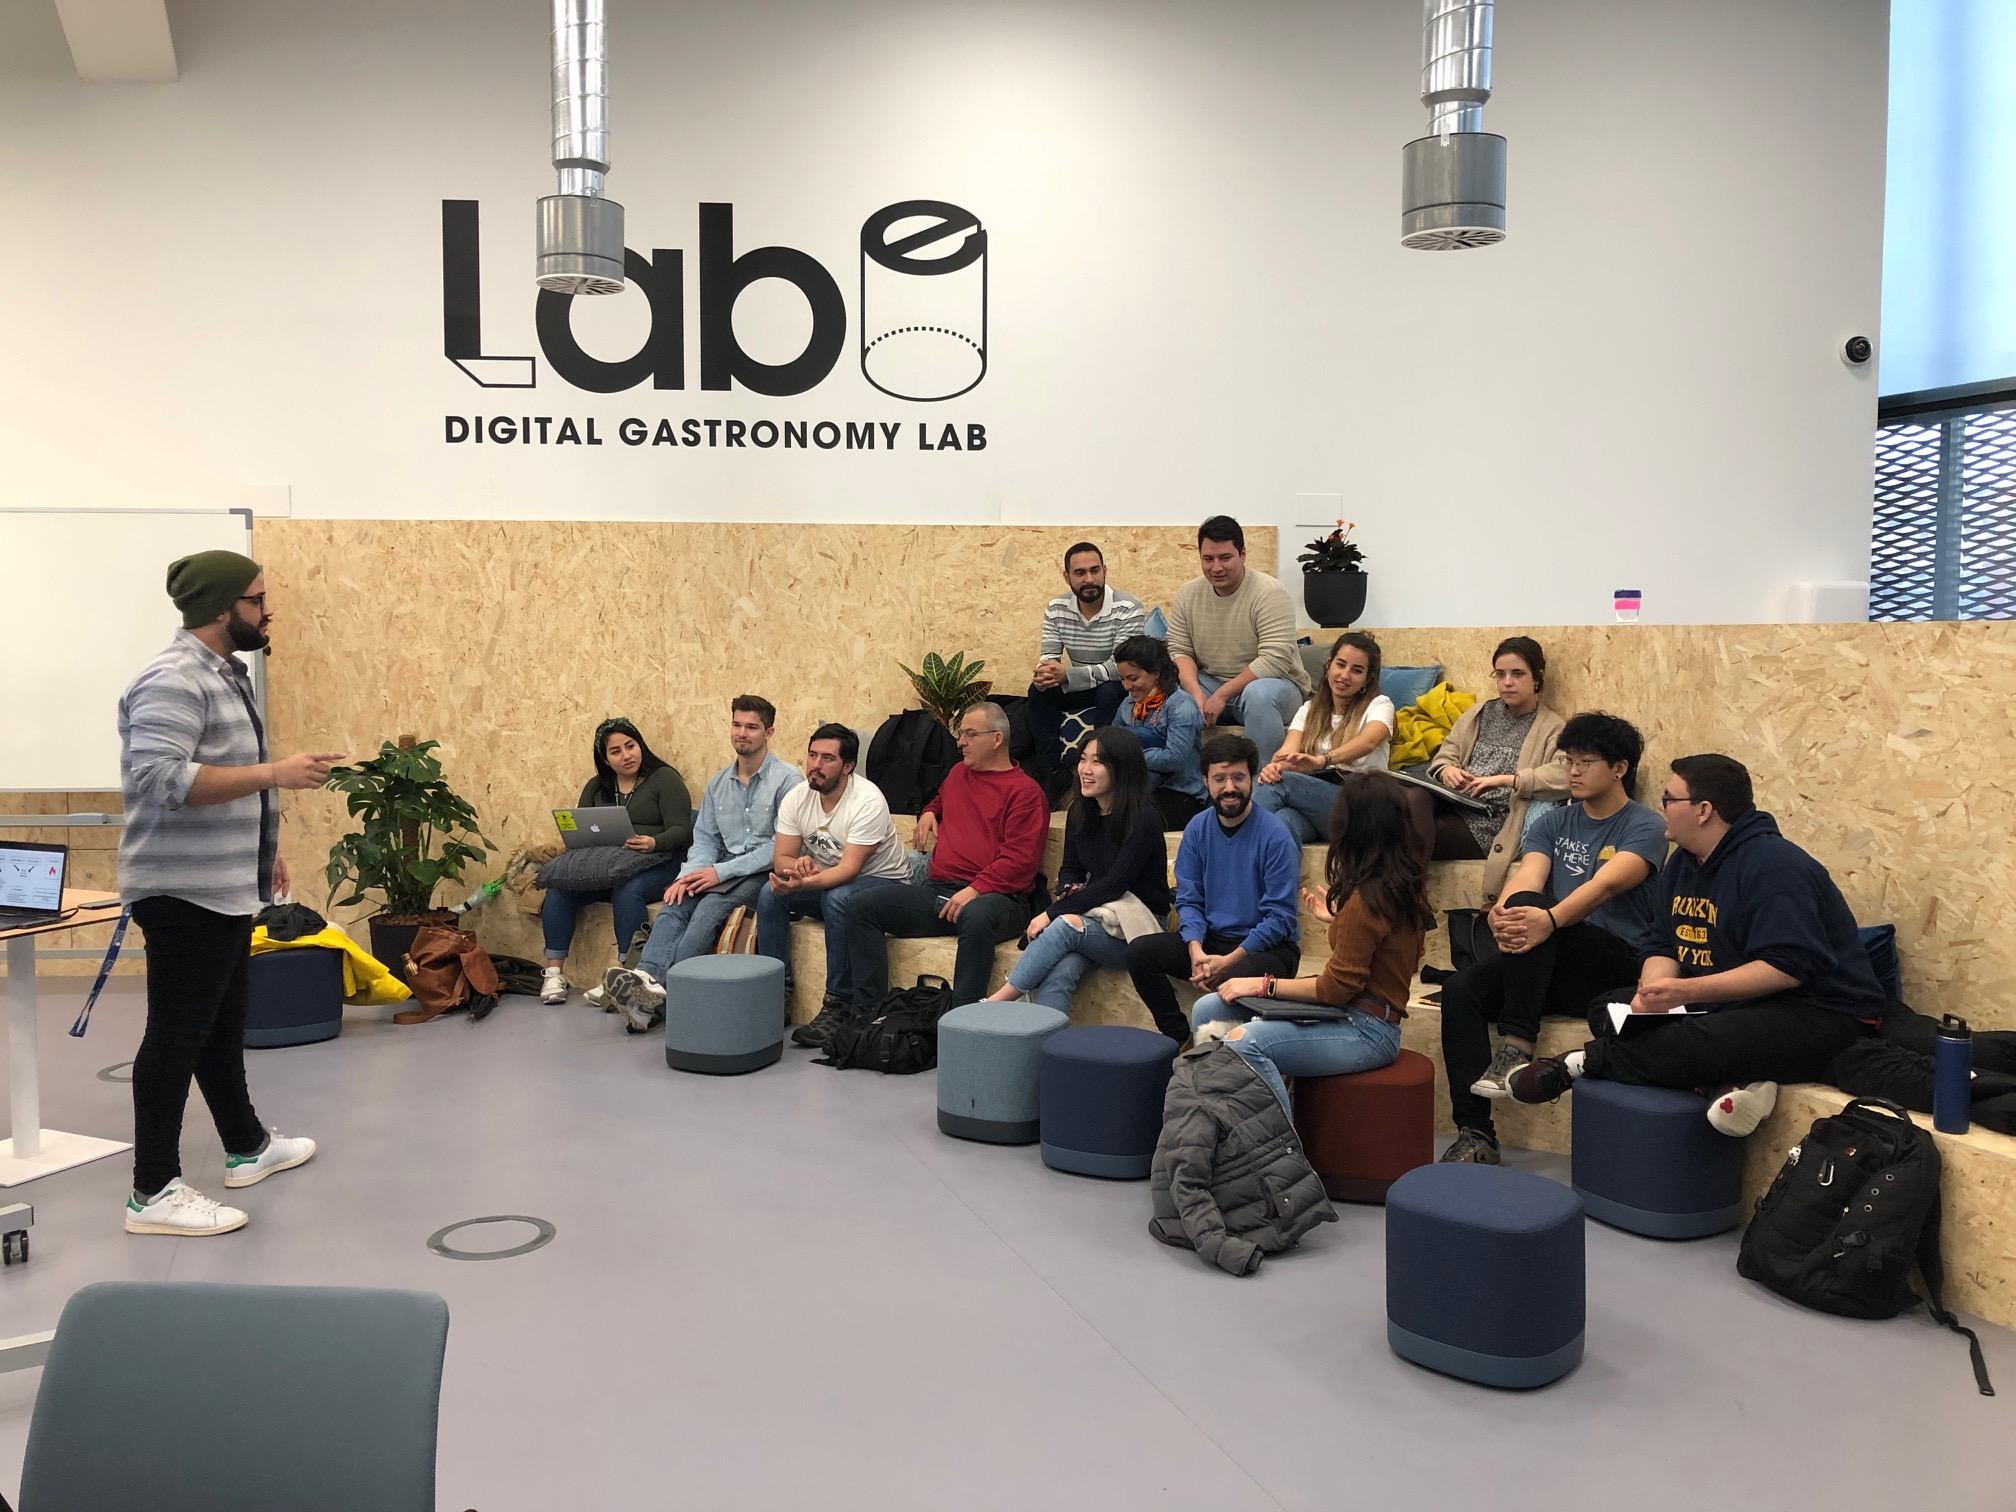 LABe Digital Gastronomy Lab, San Sebastian